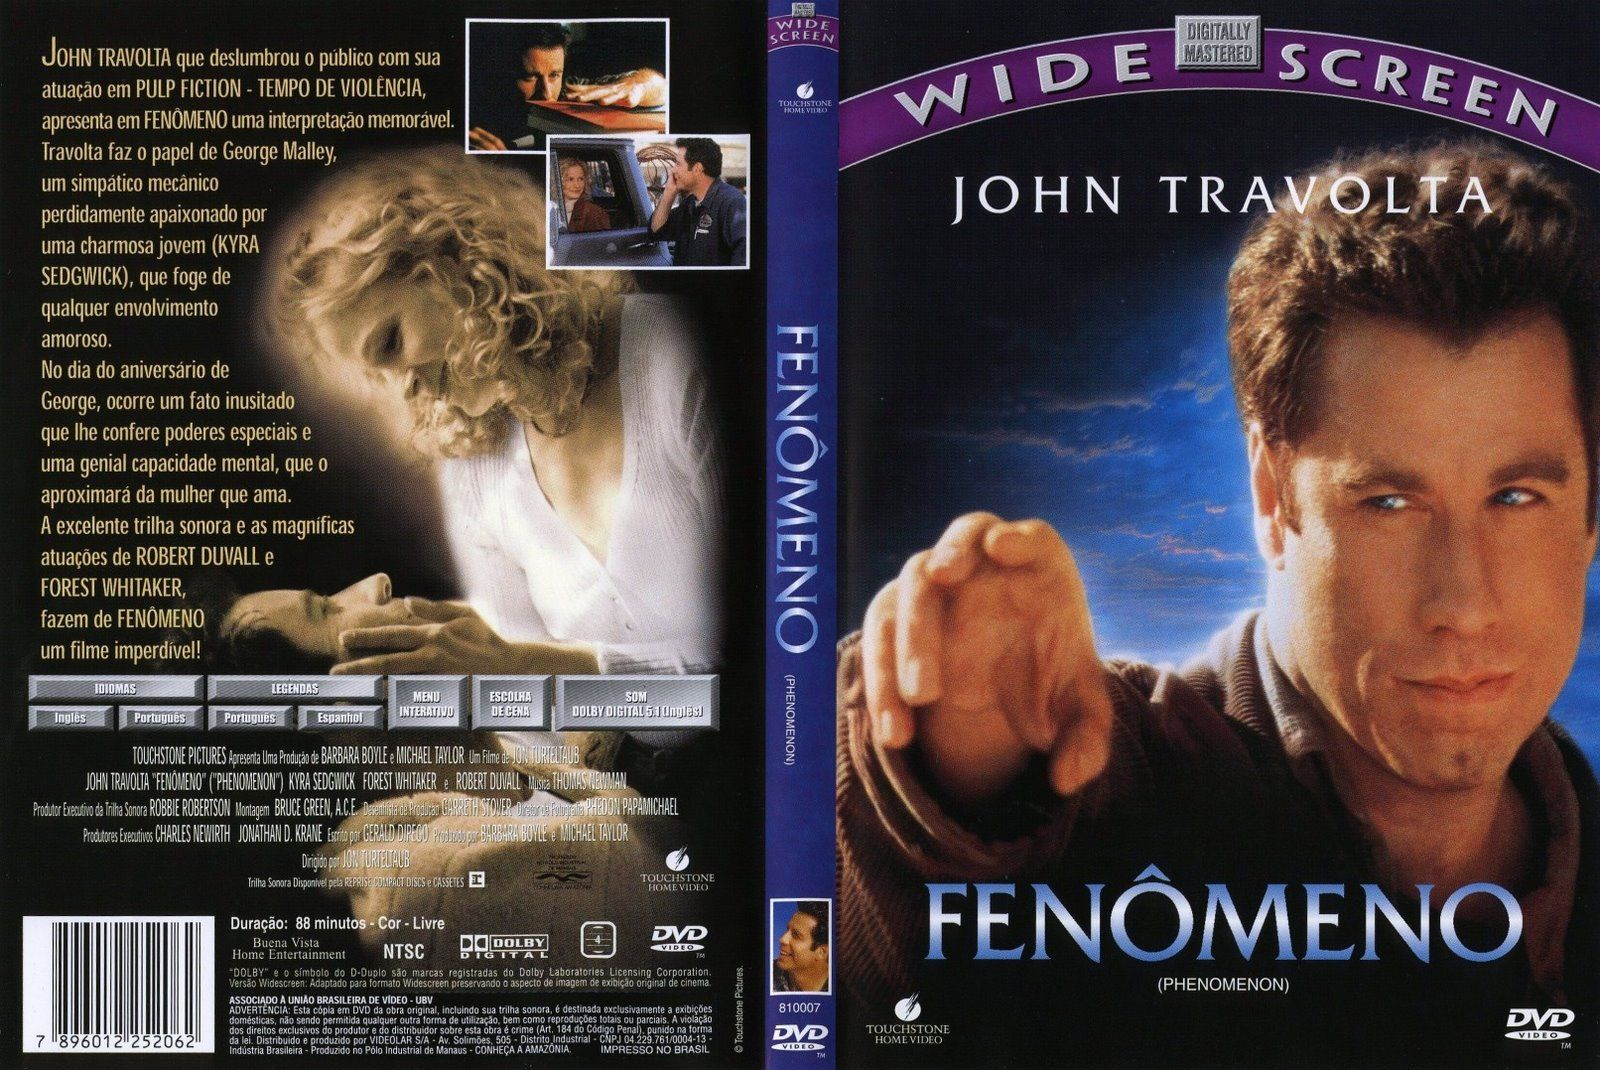 Resultado de imagem para FENÔMENO (1996)